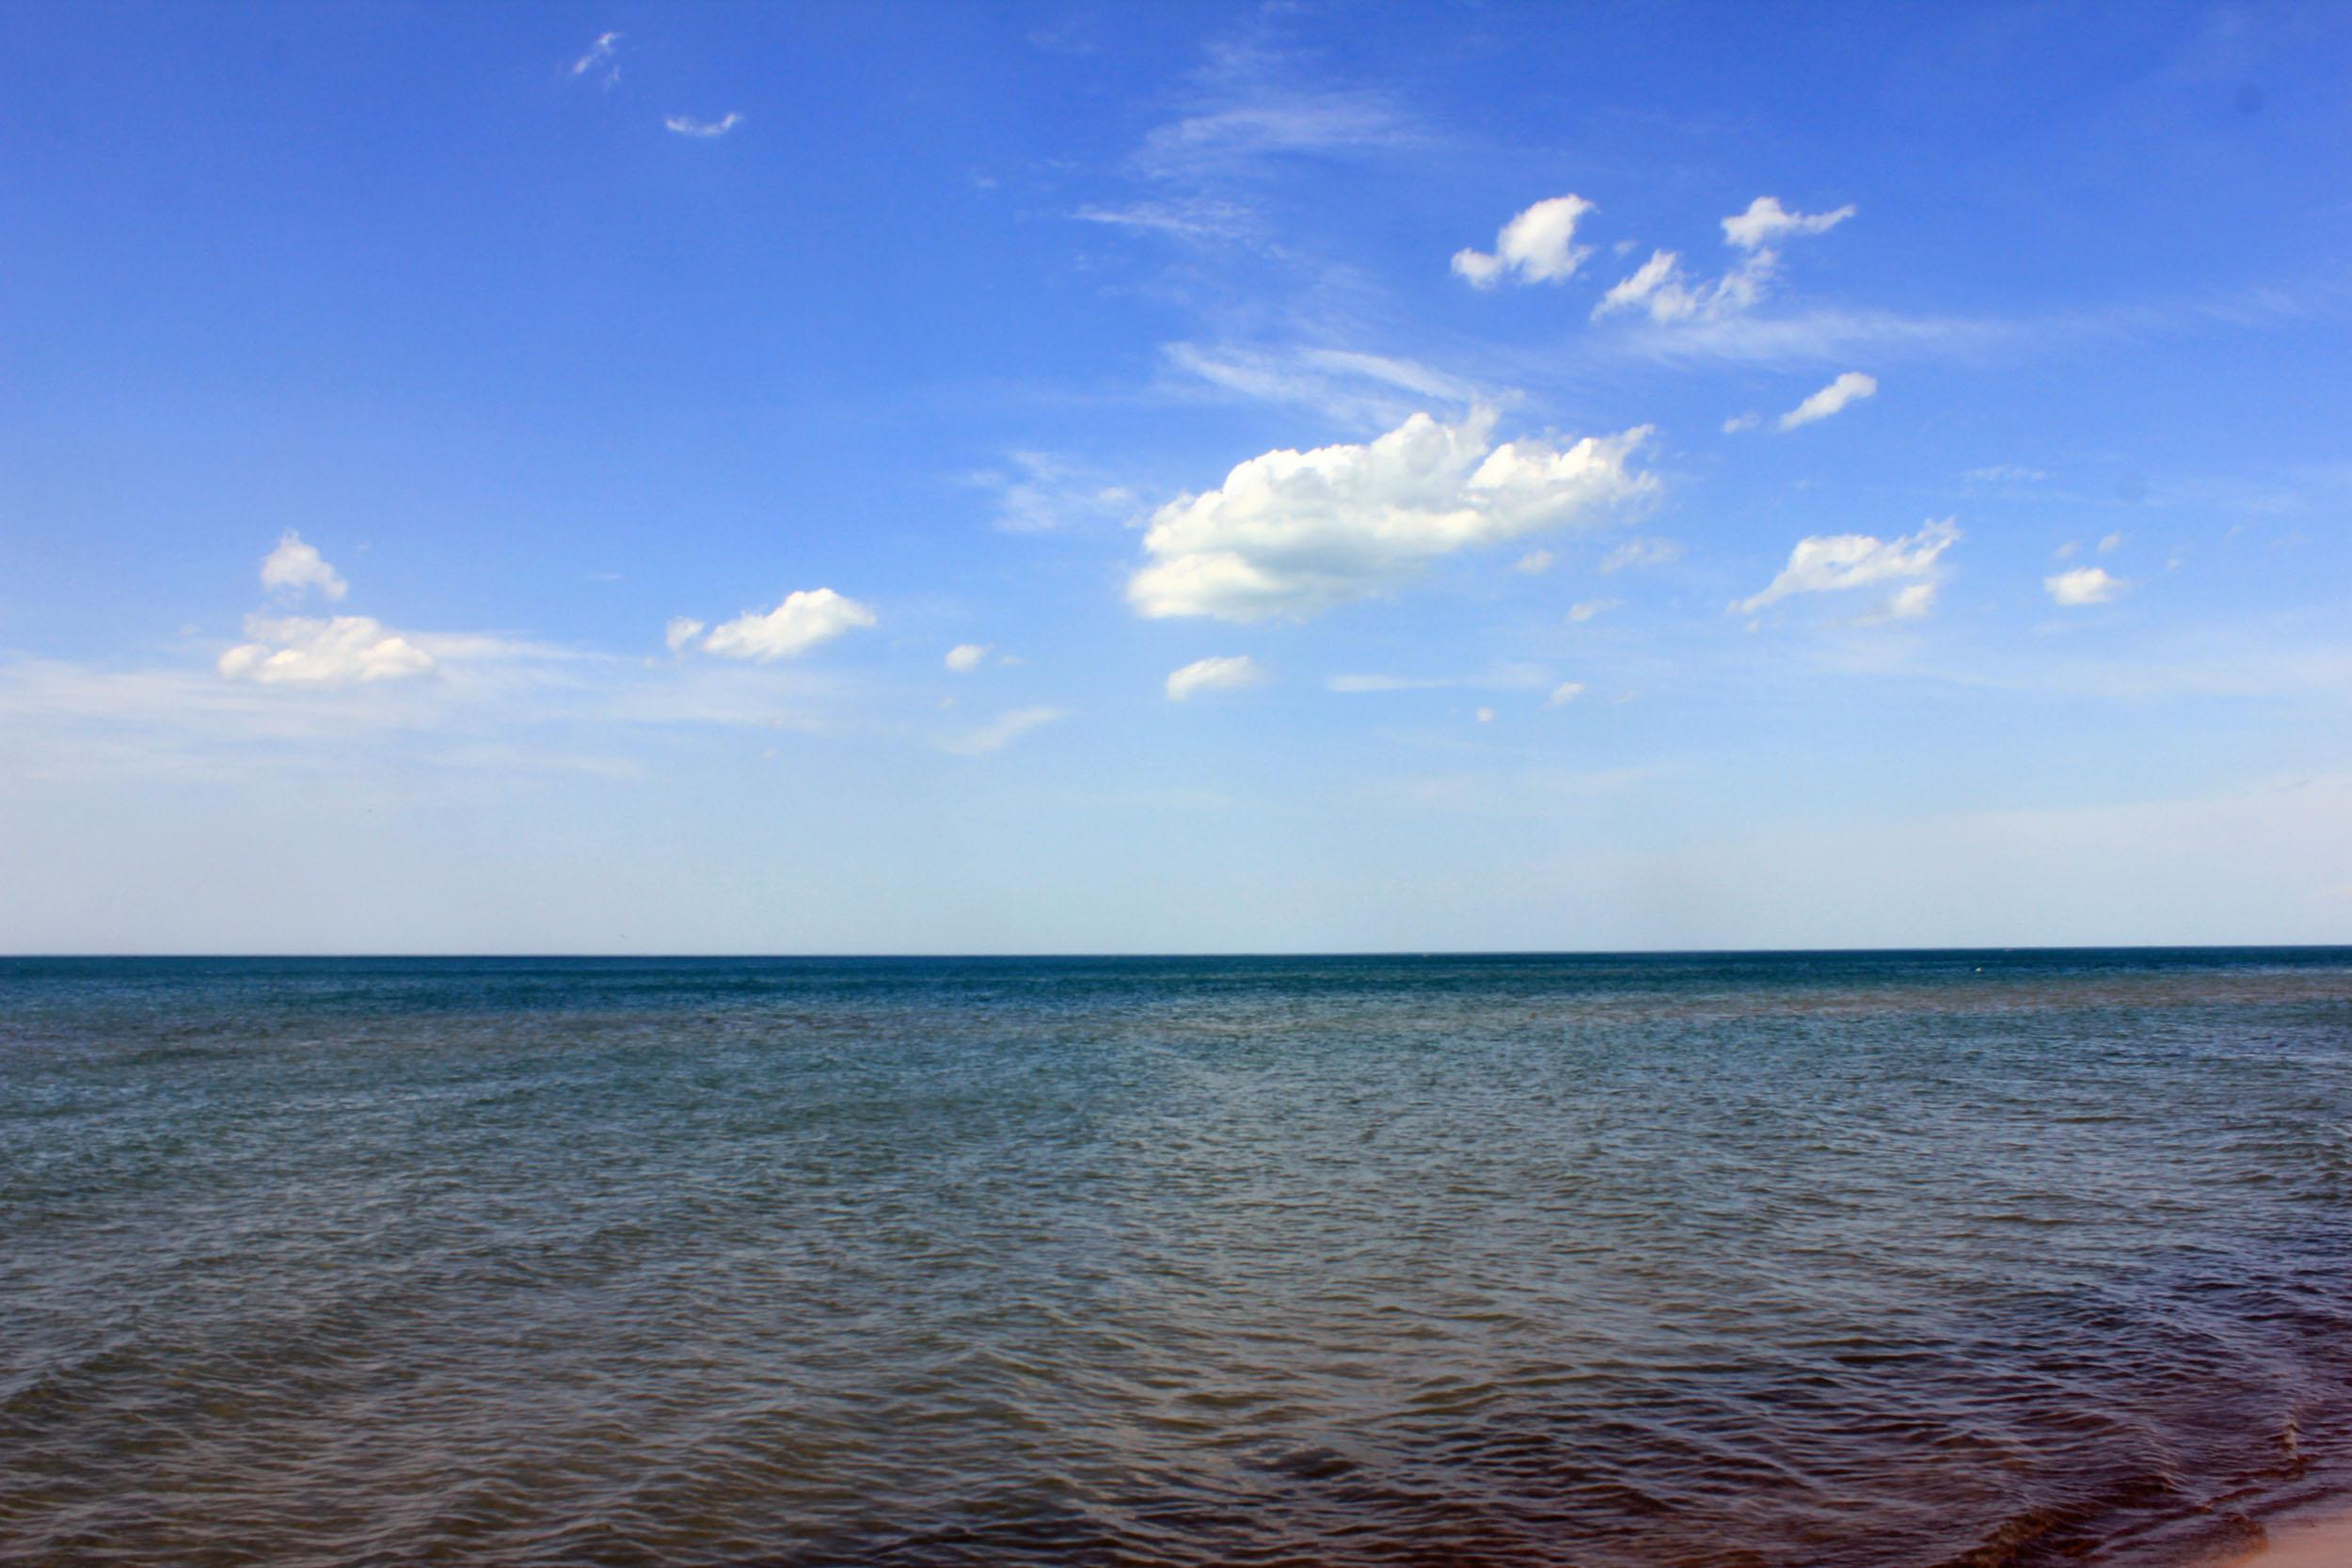 File:Gfp-indiana-dunes-national-lakeshore-lake-water-sky.jpg ...